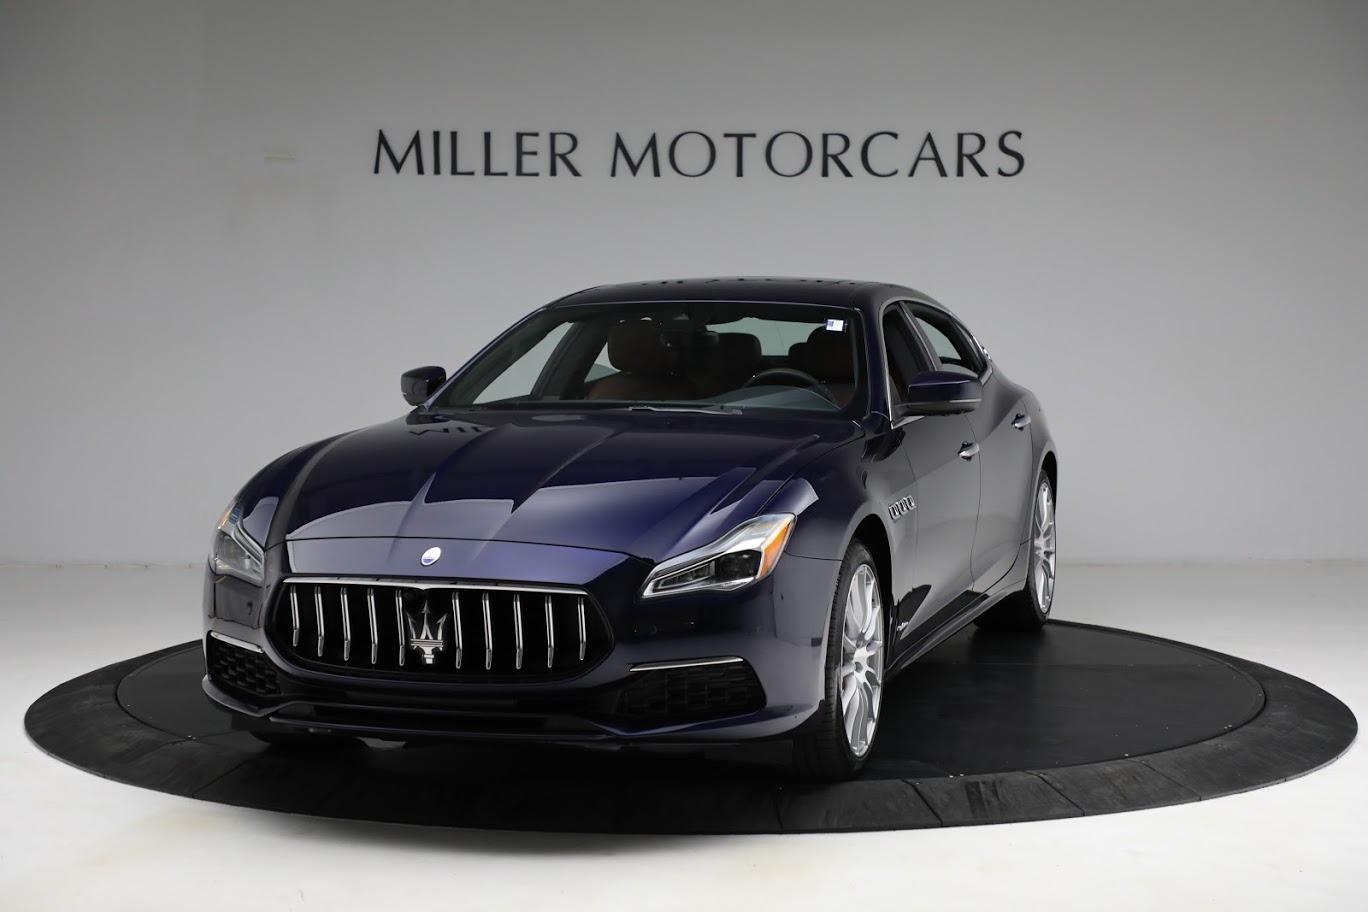 New 2021 Maserati Quattroporte S Q4 GranLusso for sale $125,149 at Rolls-Royce Motor Cars Greenwich in Greenwich CT 06830 1